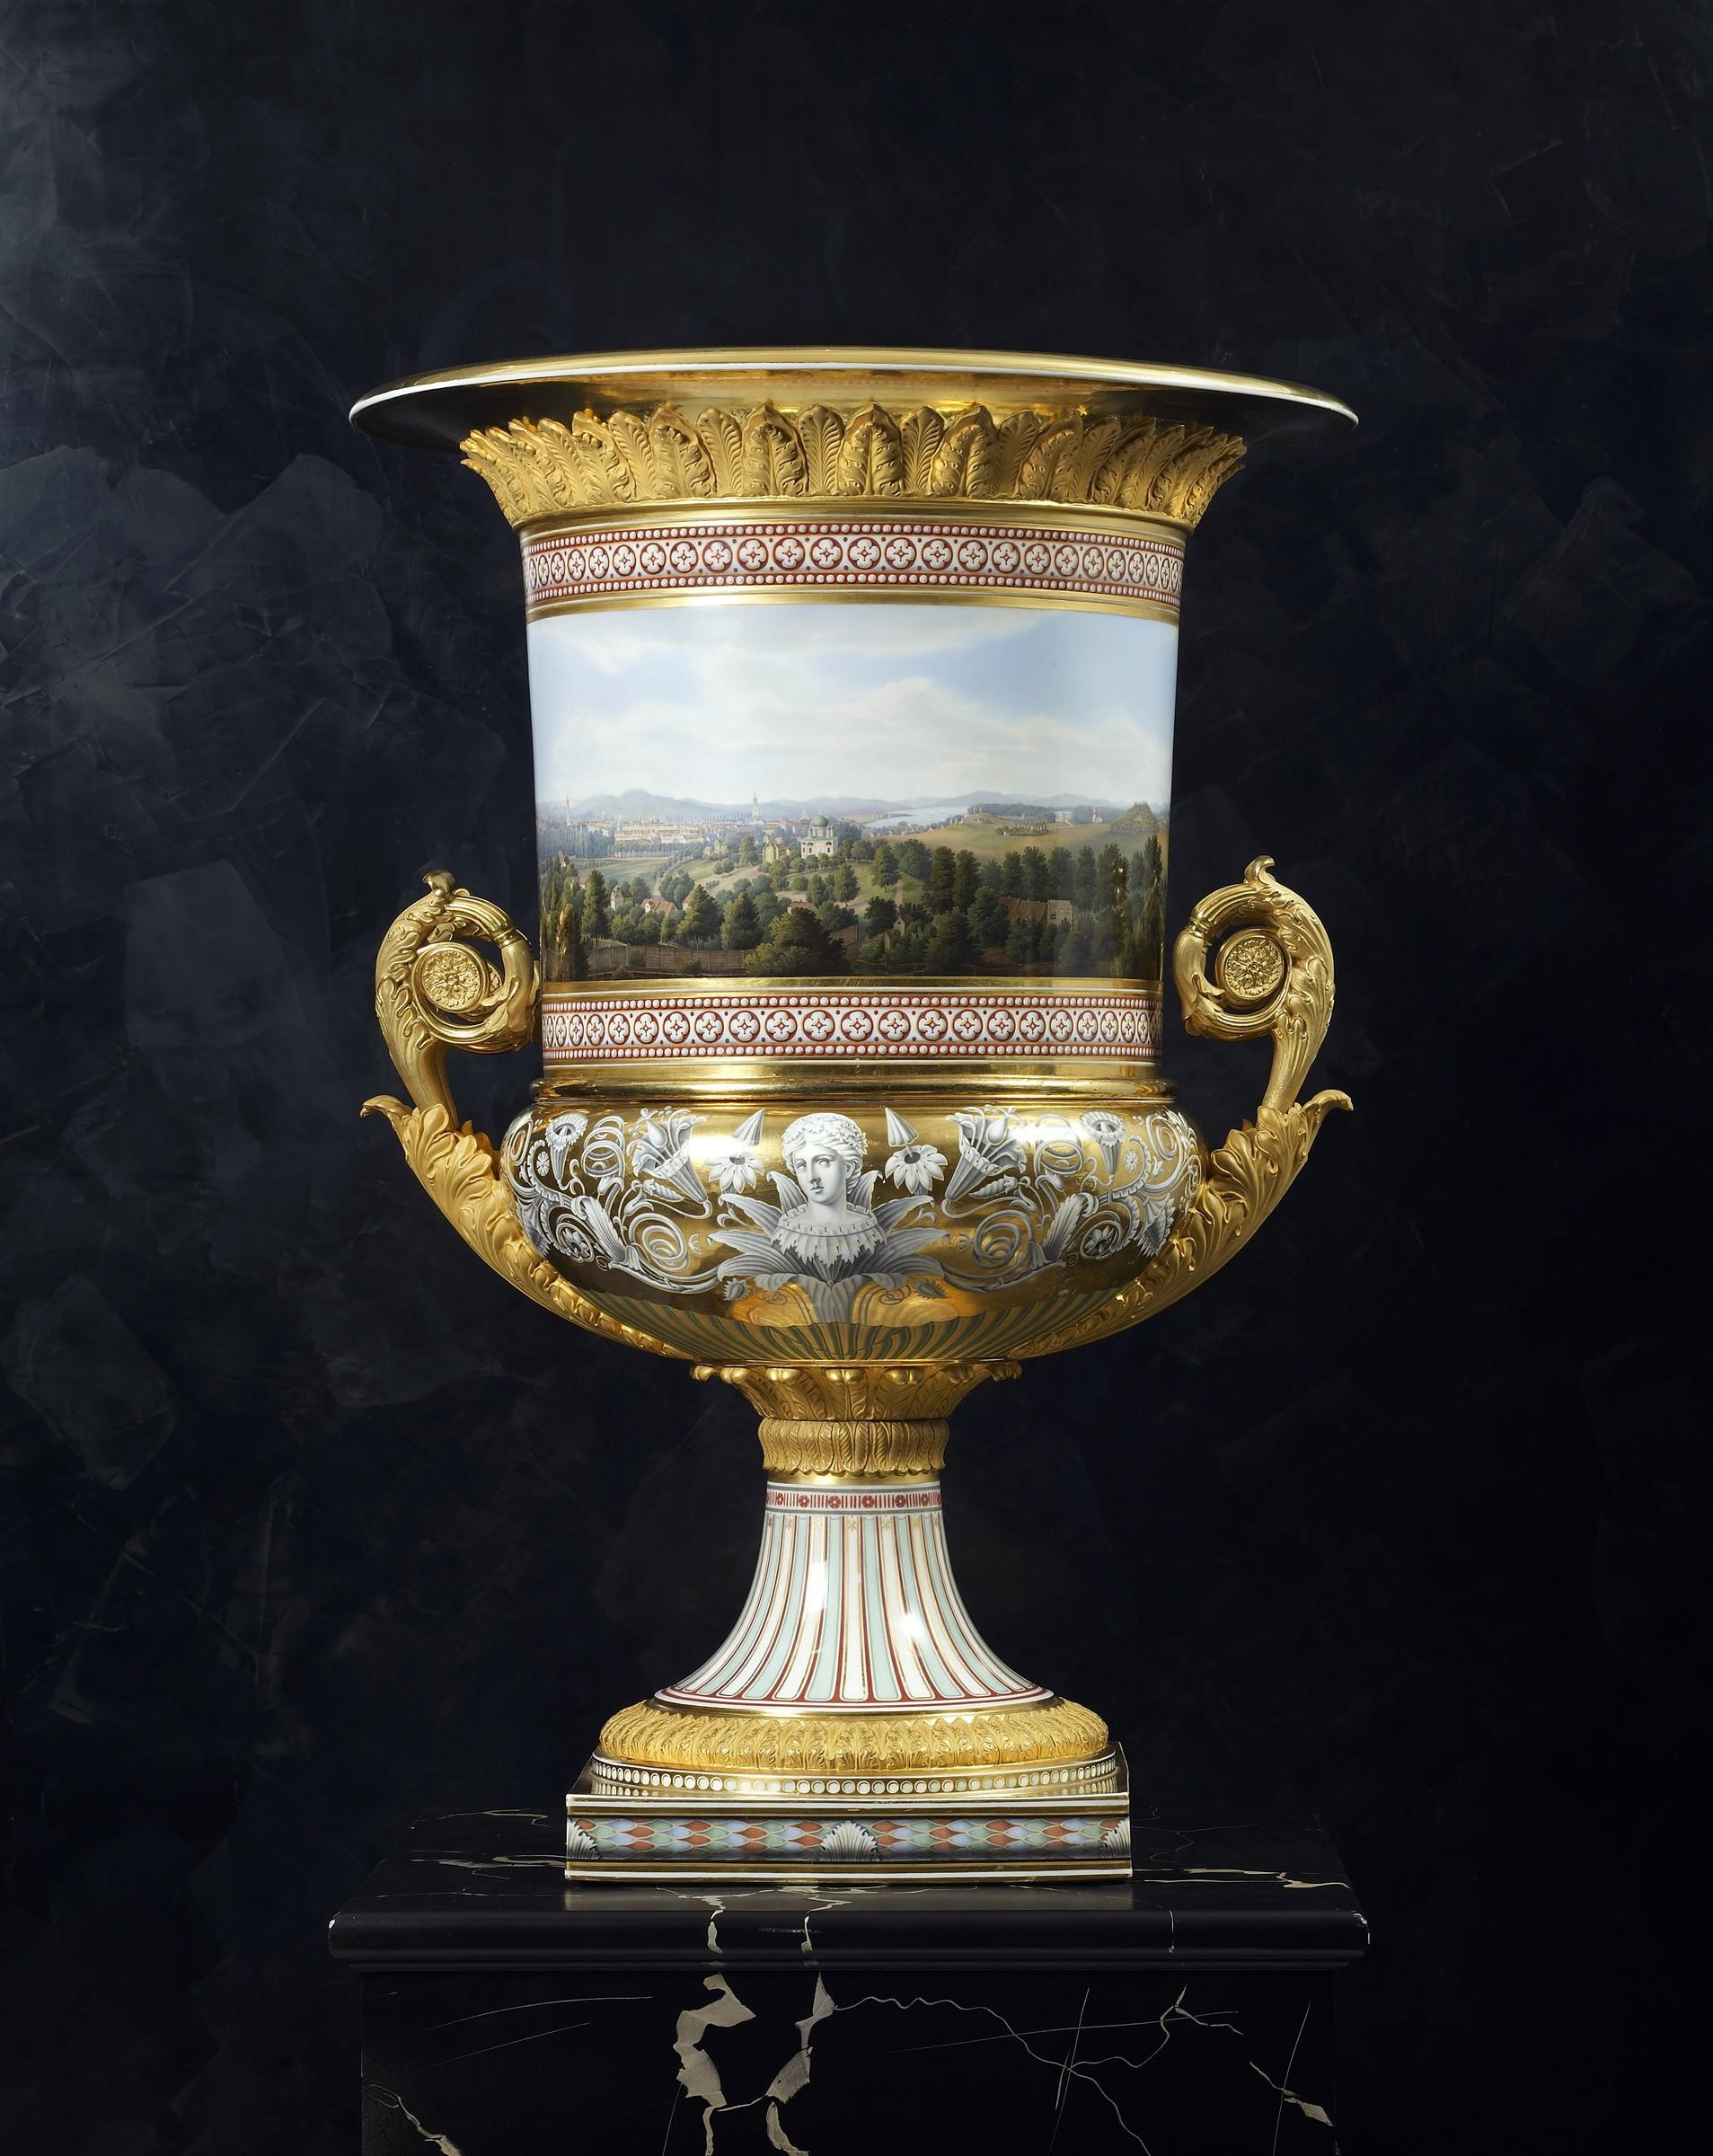 square vase stand of k p m ka¶nigliche porzellan manufaktur berlin a classical medici throughout a classical medici vase made by the royal berlin porcelain manufactory